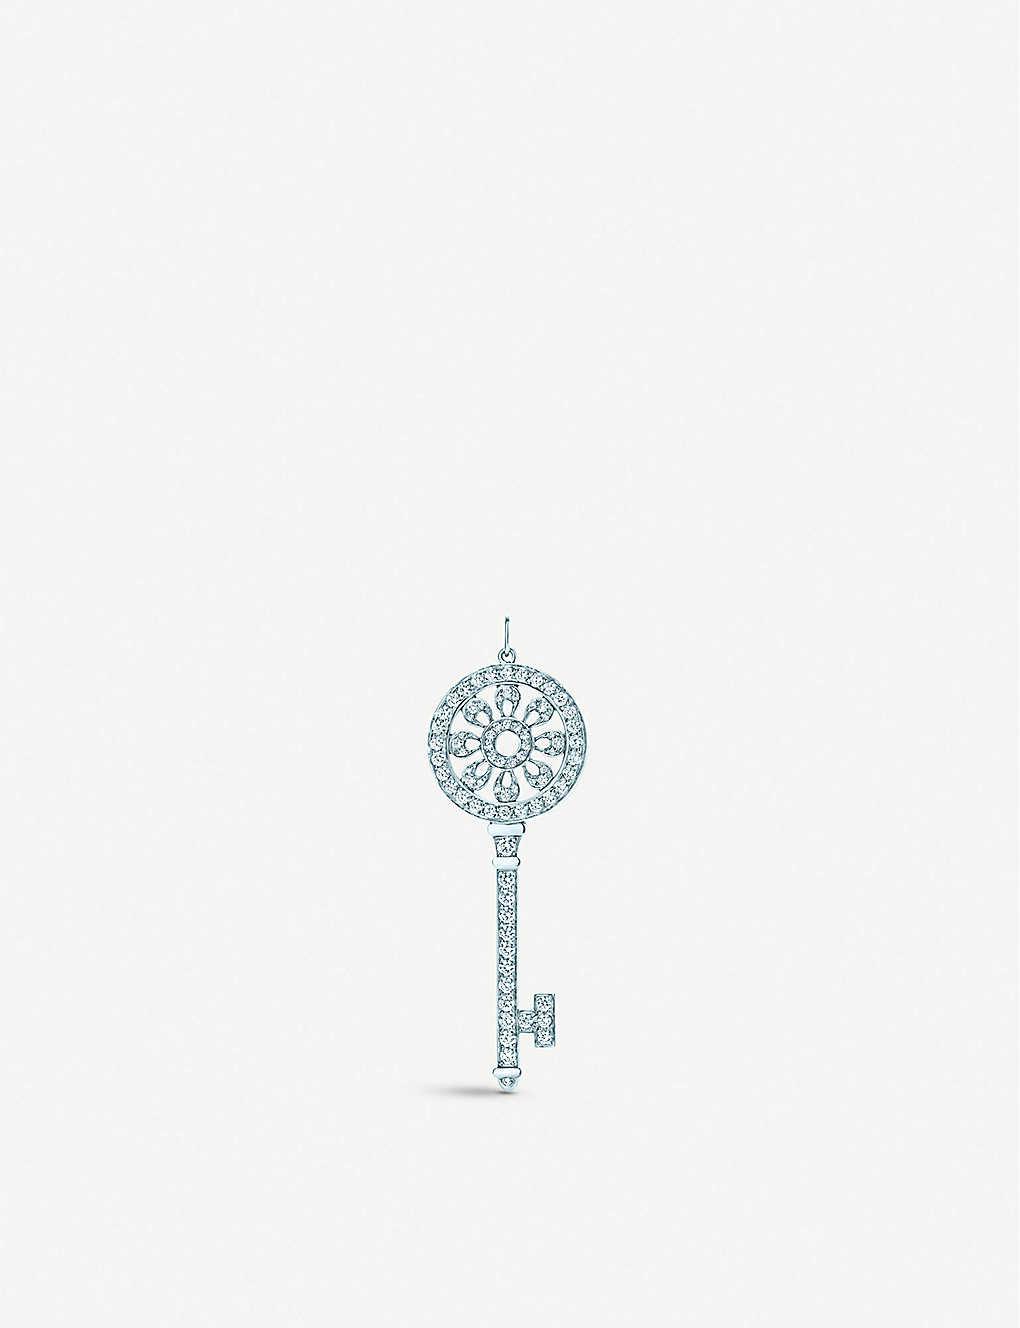 96c46483e25c TIFFANY   CO - Tiffany Keys petals key diamond pendant in platinum ...